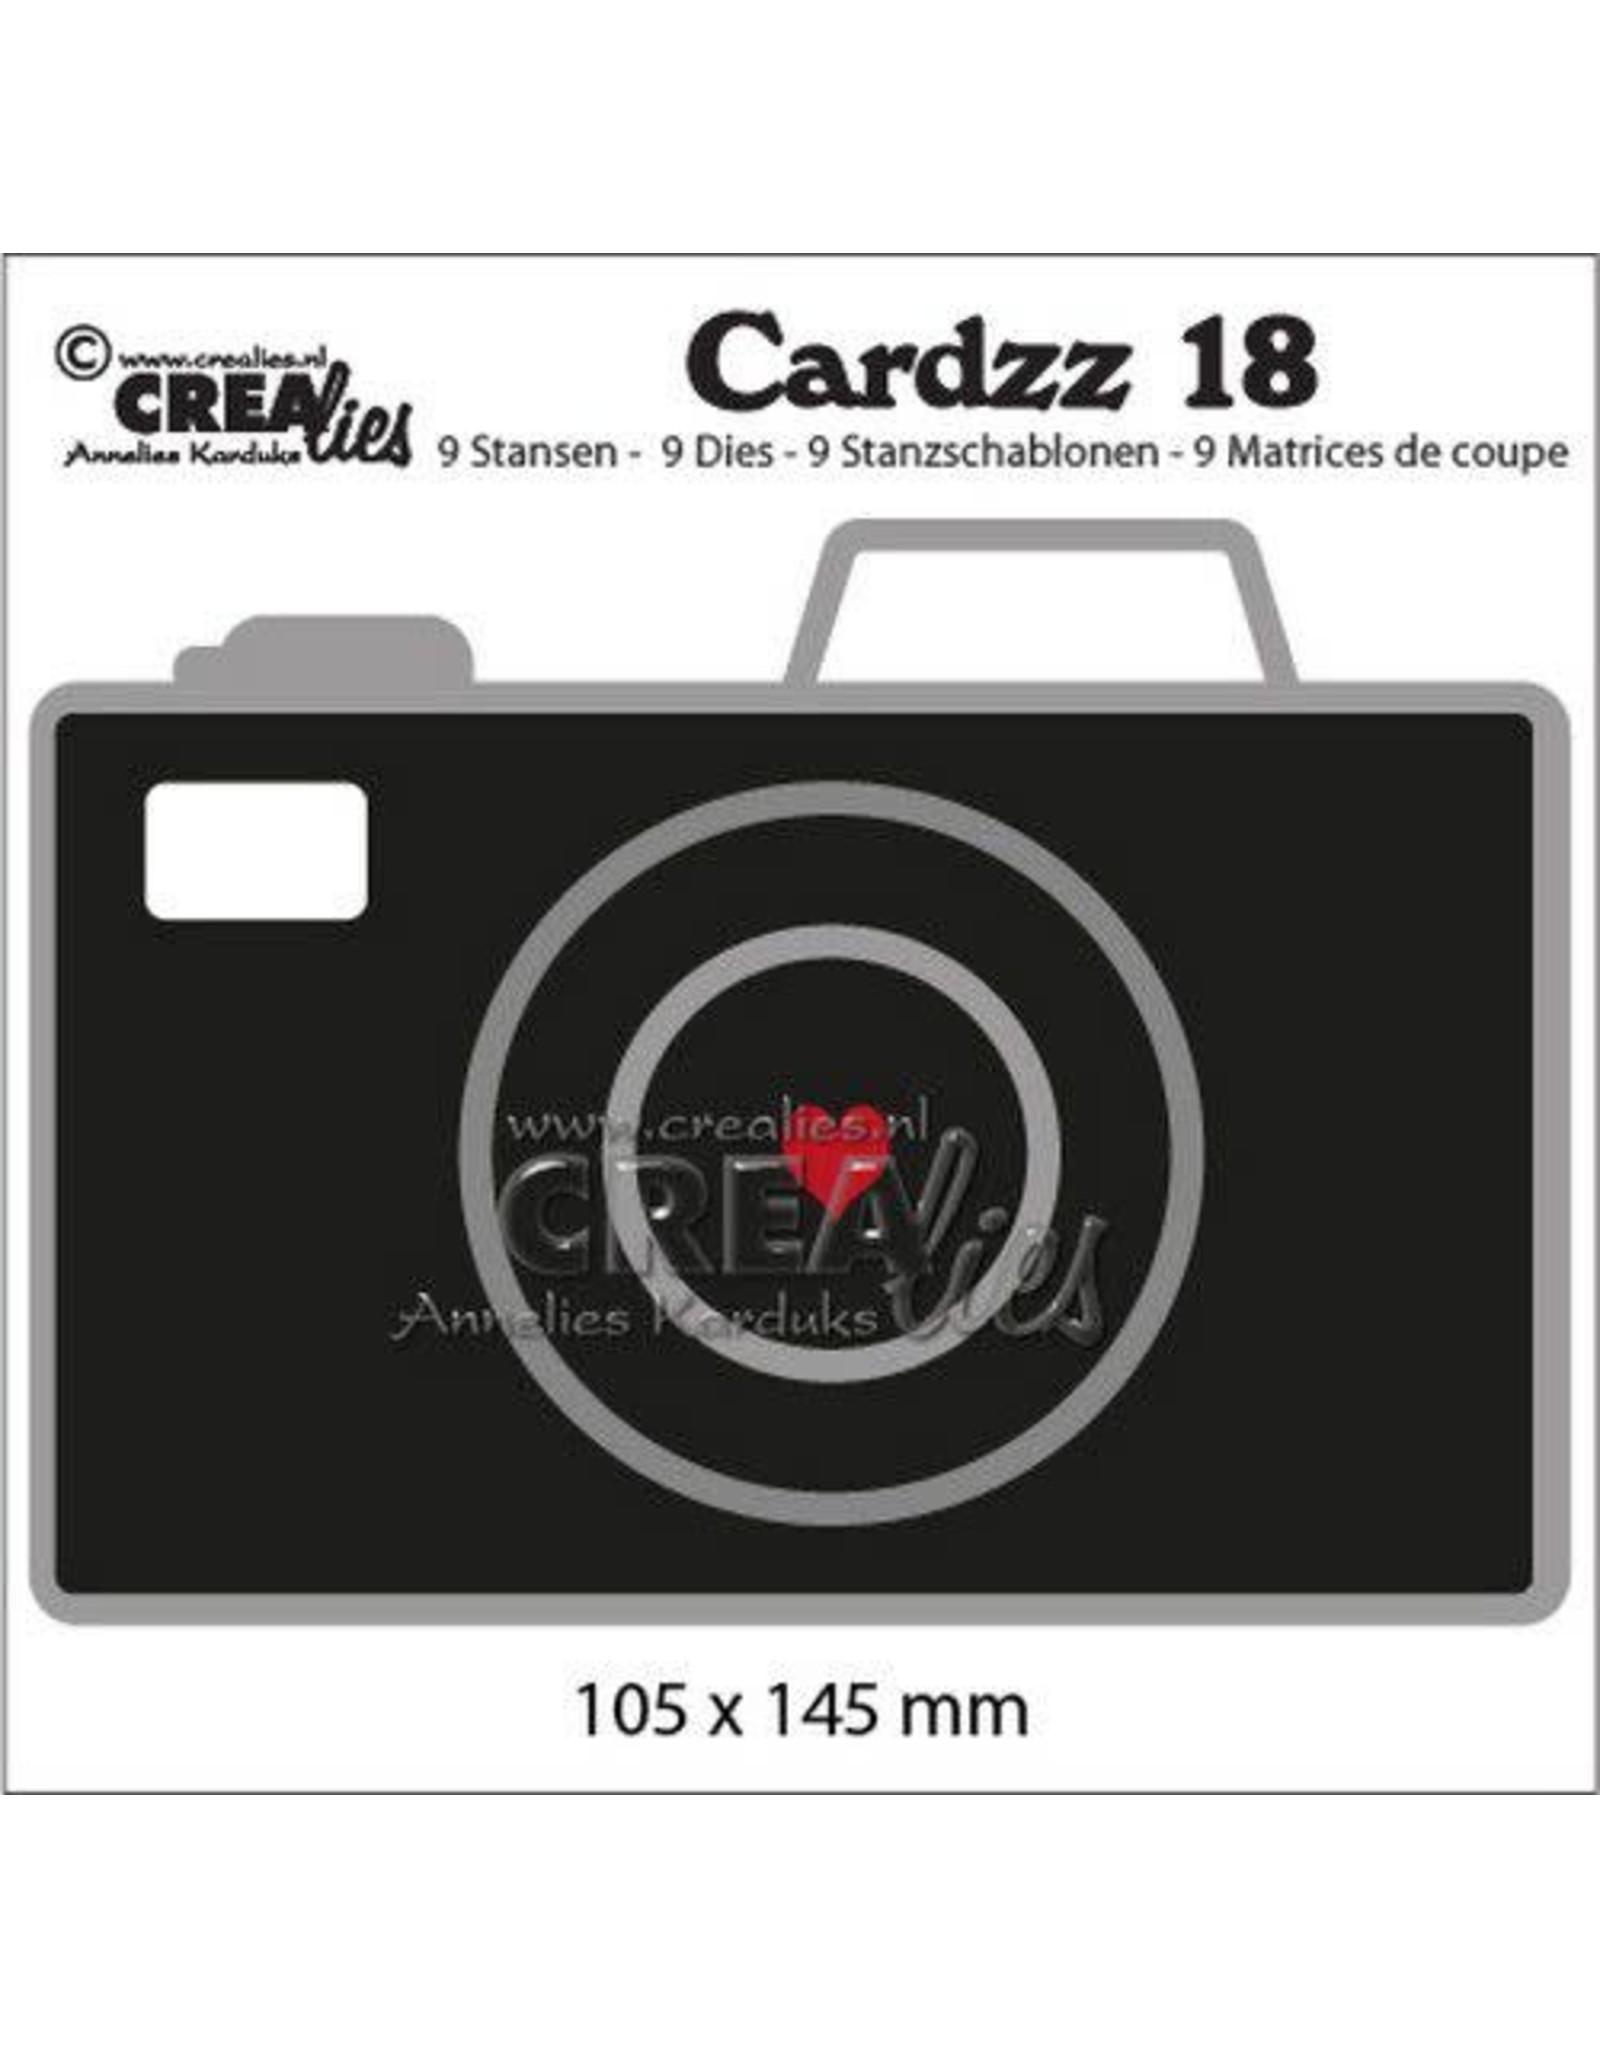 Crealies Crealies Cardzz no 18 Camera CLCZ18 105x145mm